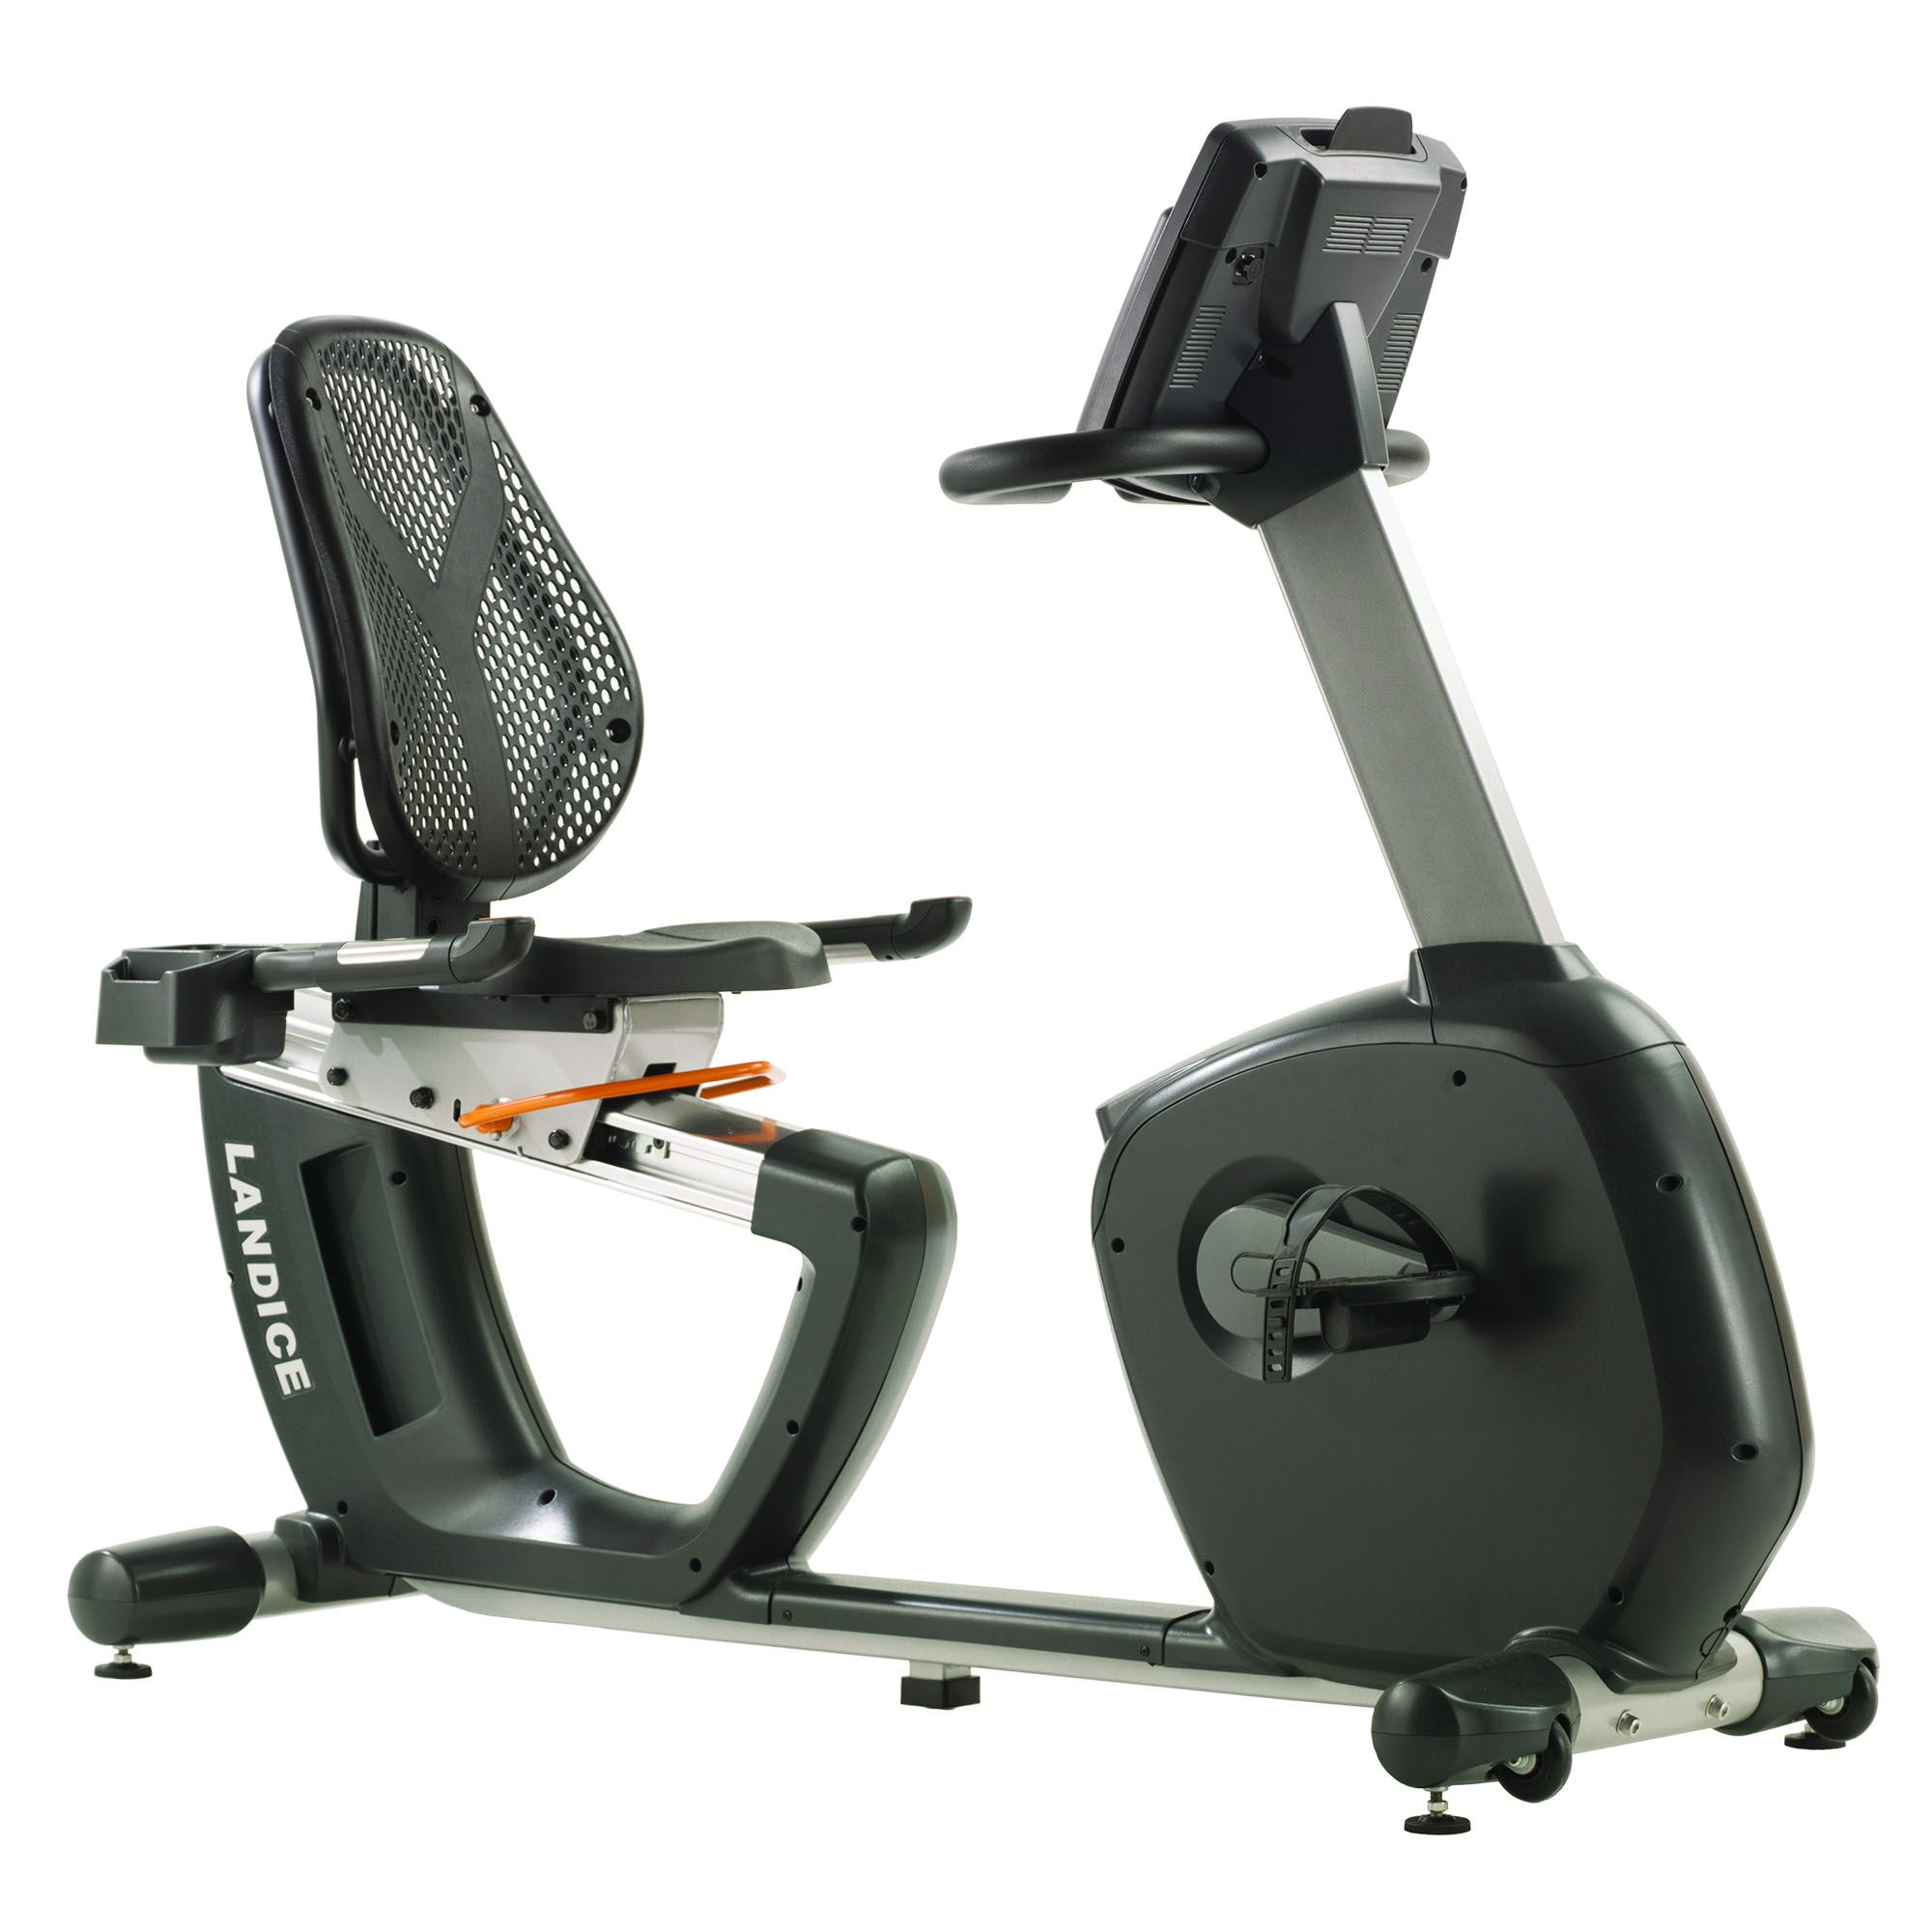 Landice R9 Recumbent Exercise Bike